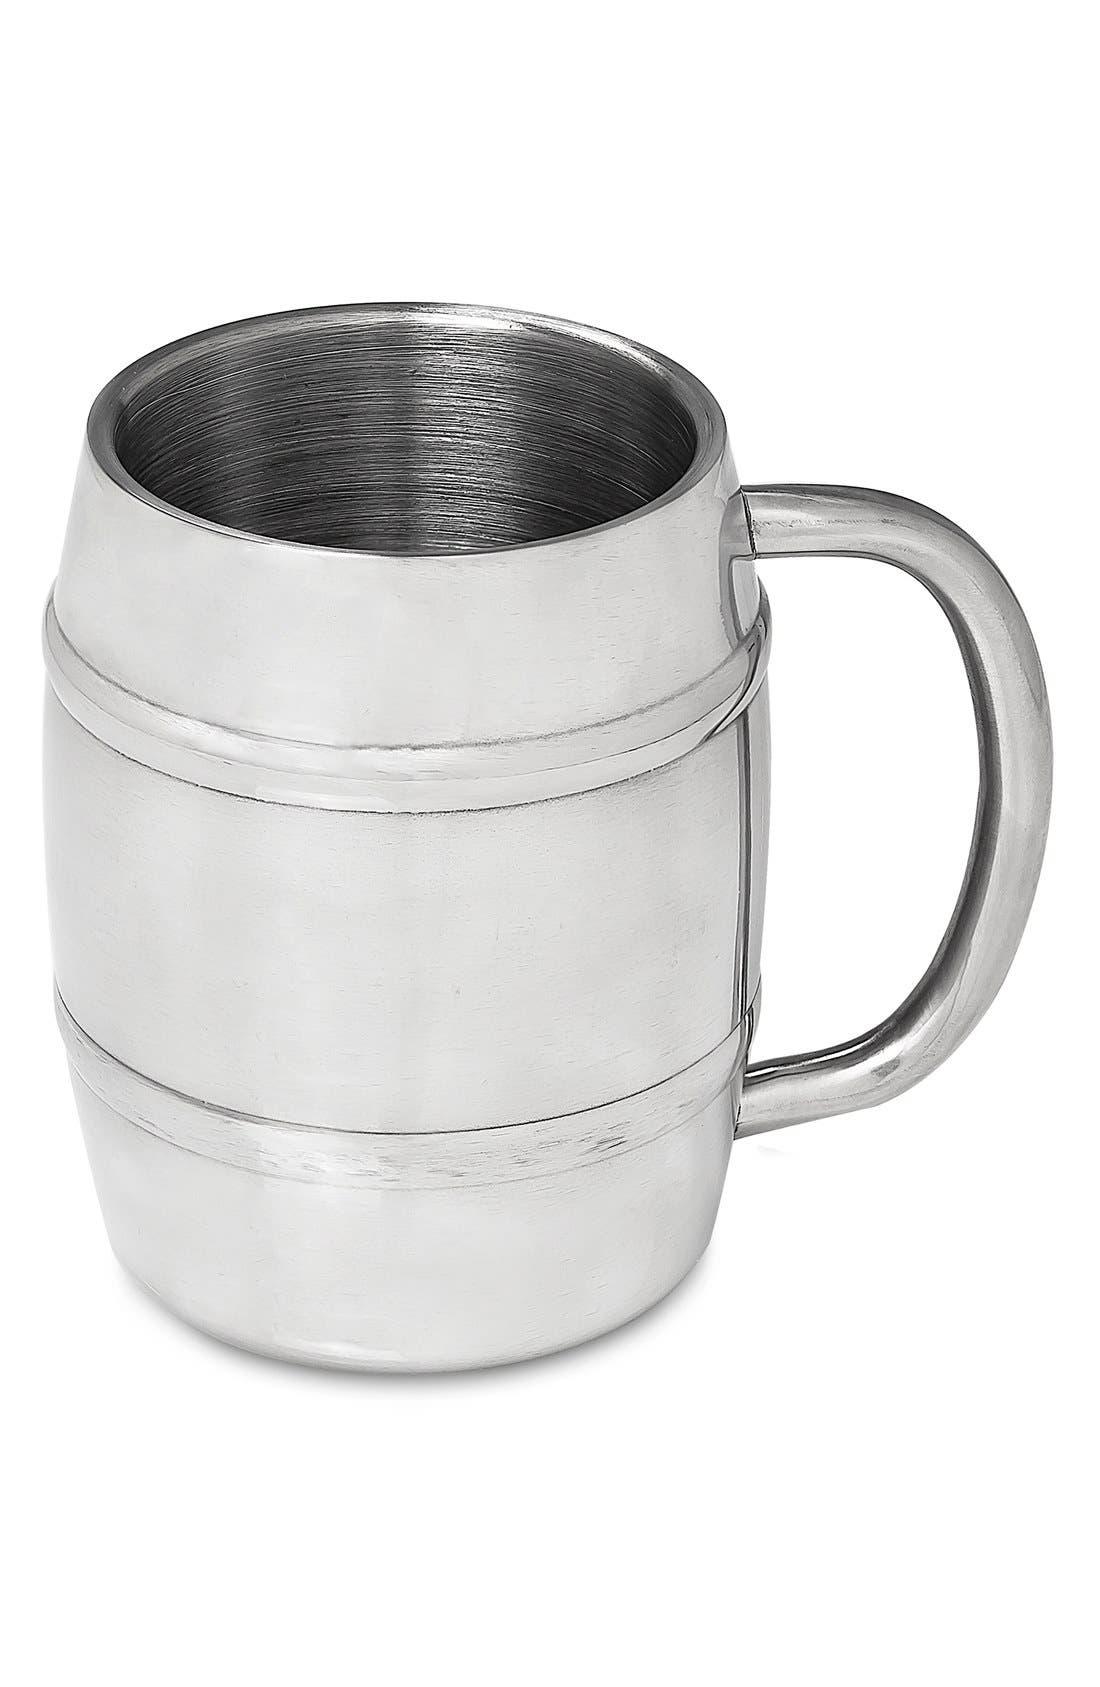 Monogram Stainless Steel Keg Mug,                             Main thumbnail 2, color,